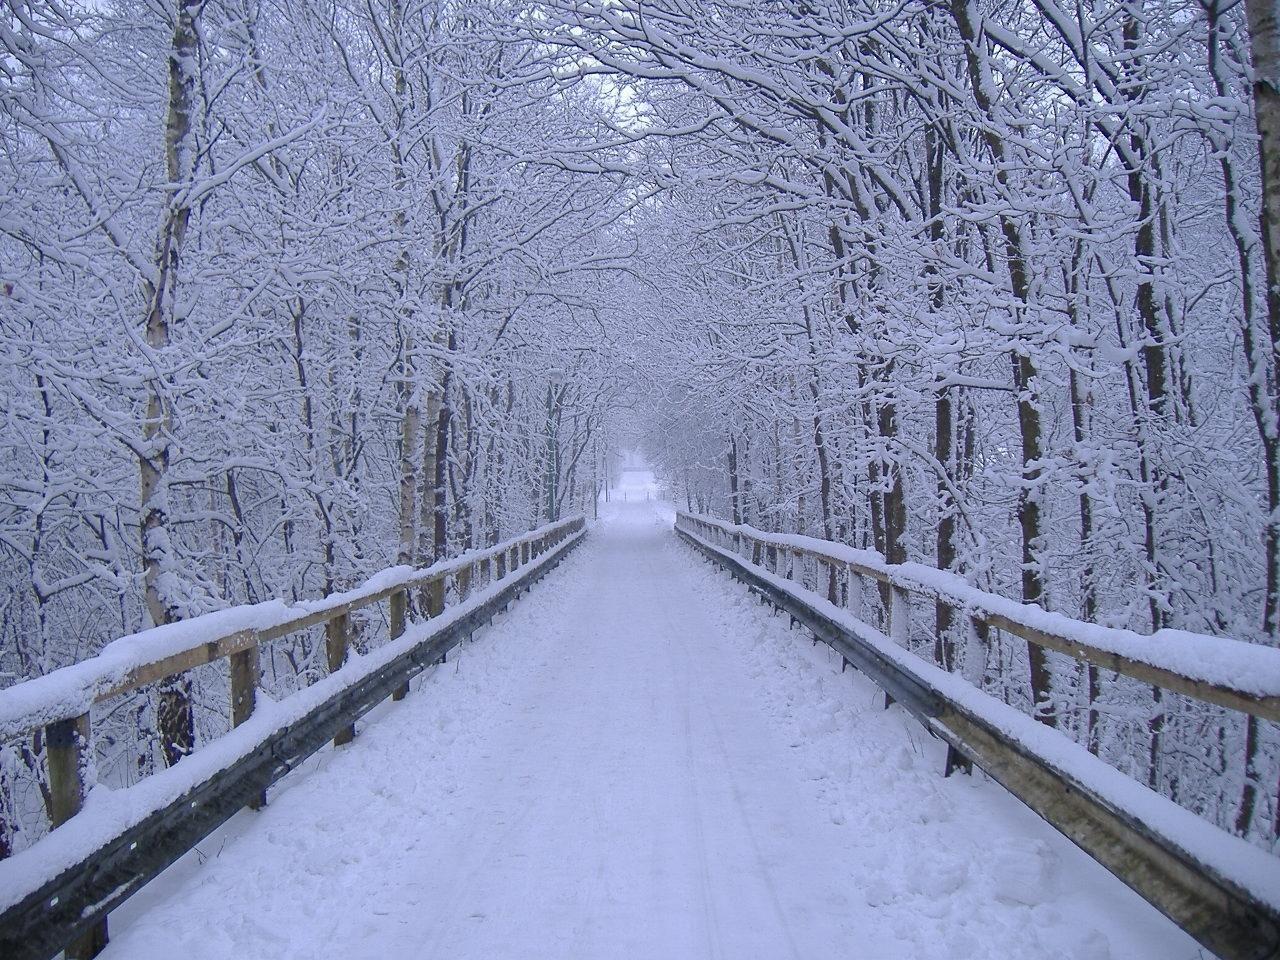 Free winter screensavers wallpaper free winter screensavers hd free winter screensavers wallpaper free winter screensavers hd voltagebd Image collections